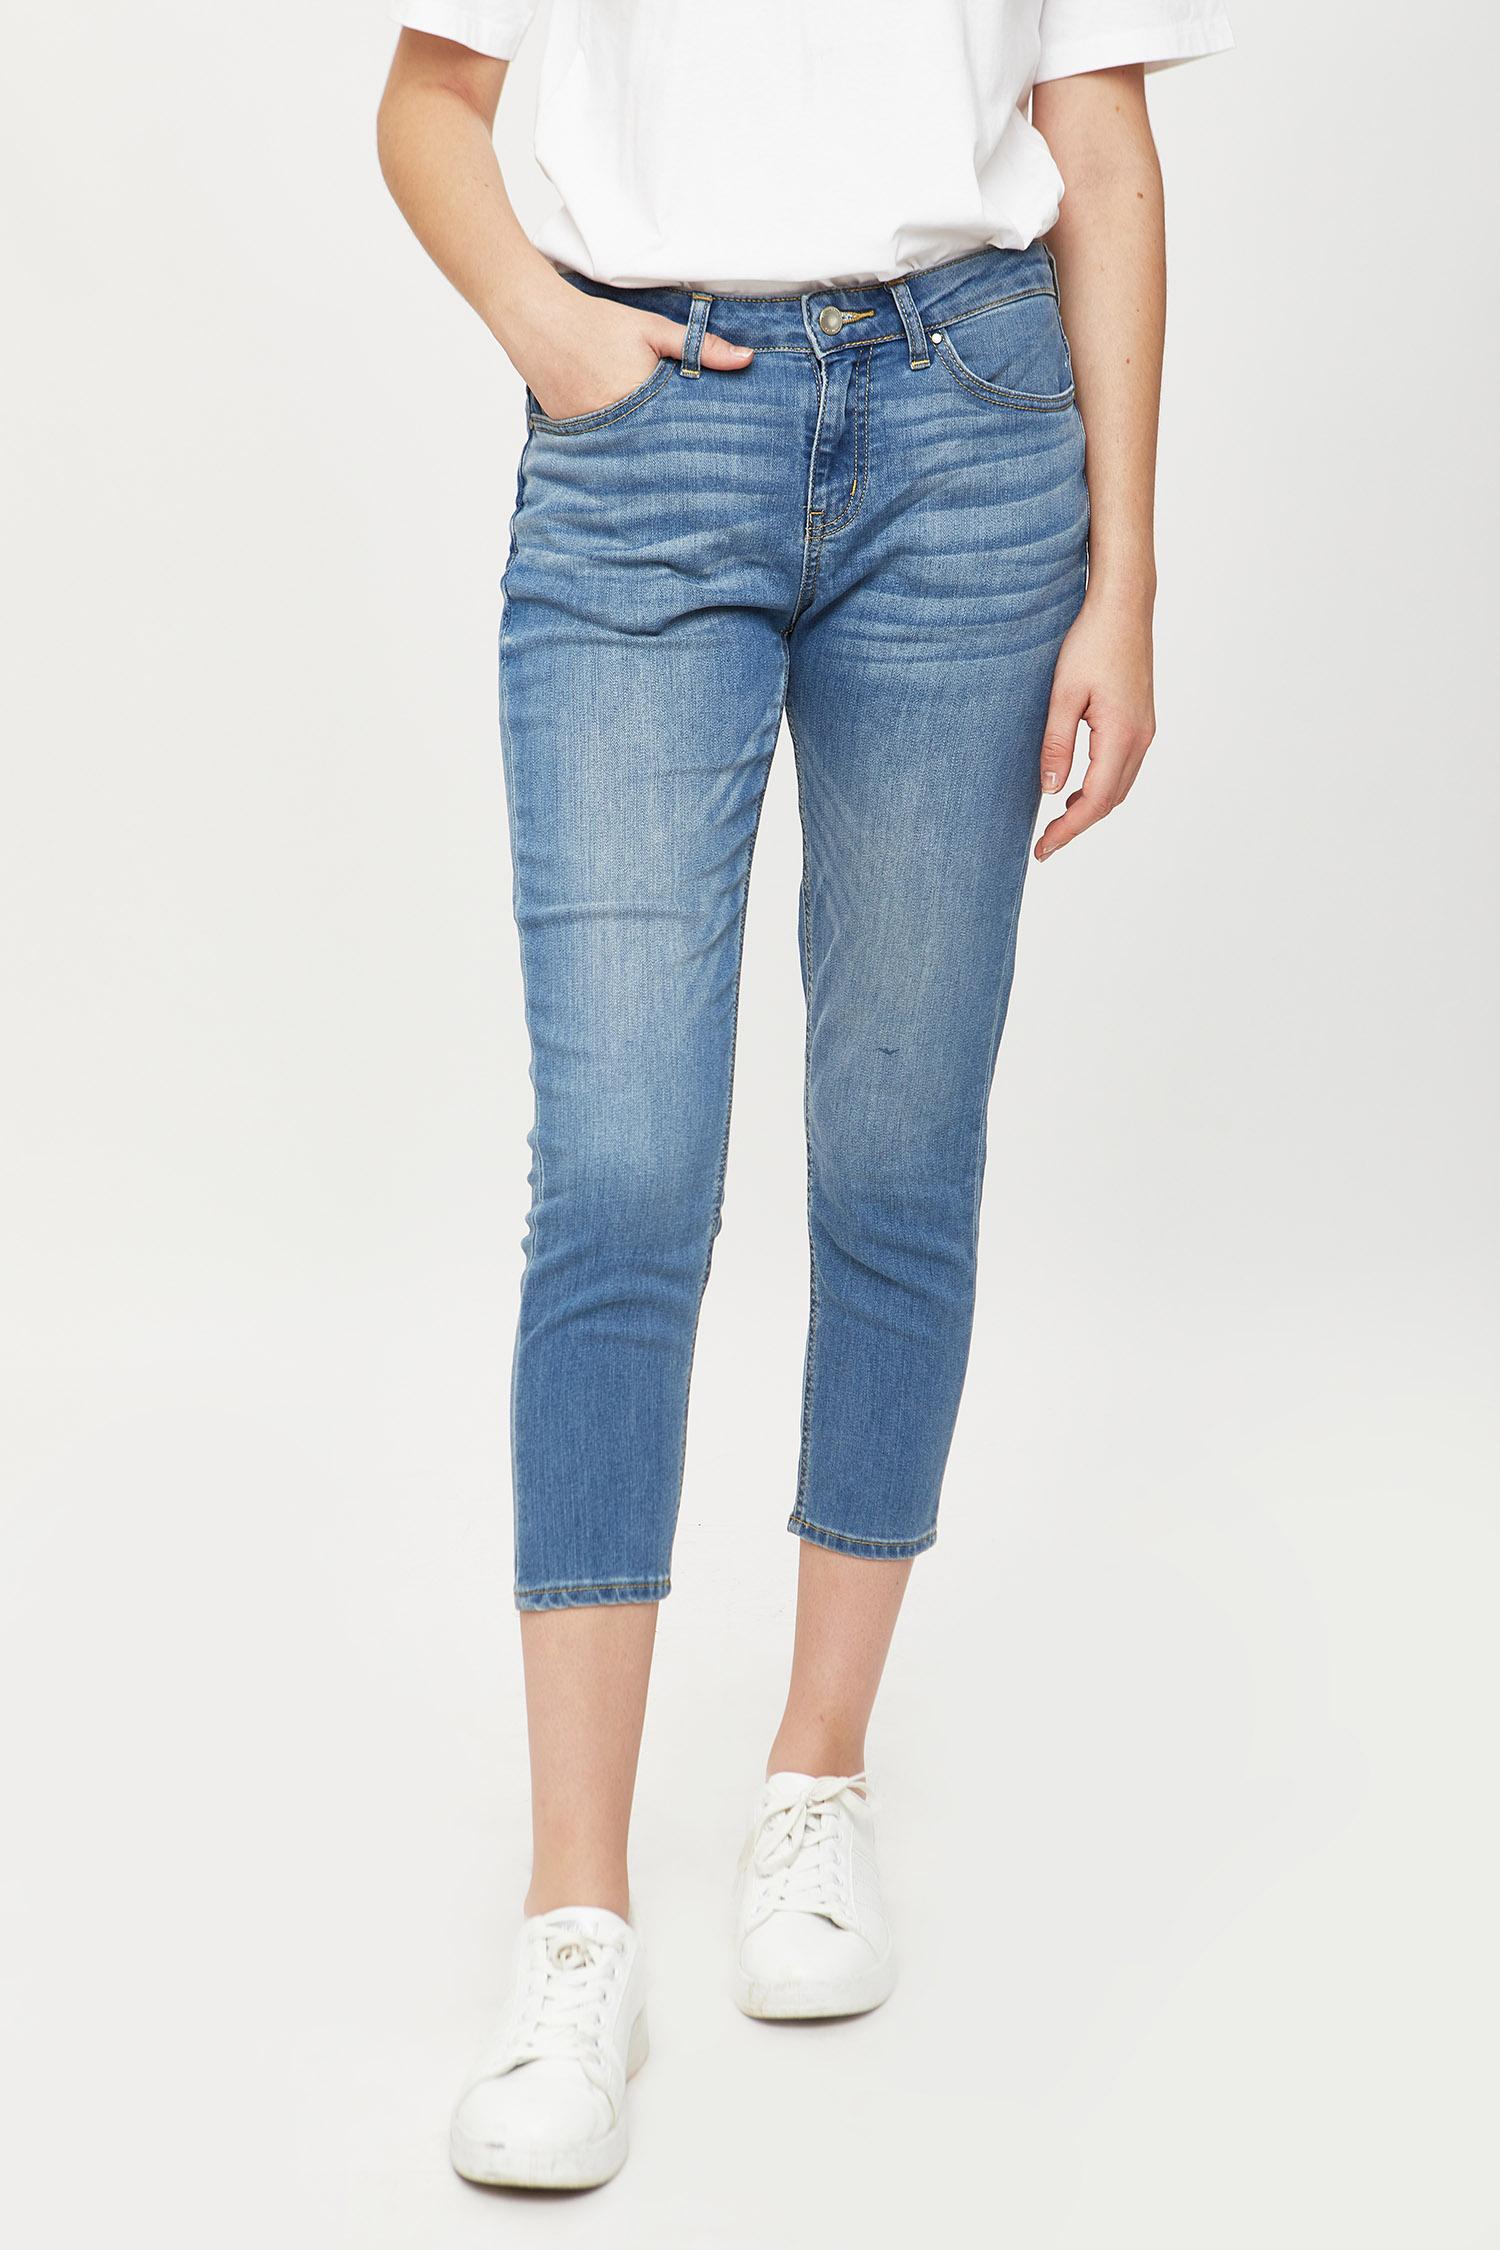 quần jean nữ - 1904024